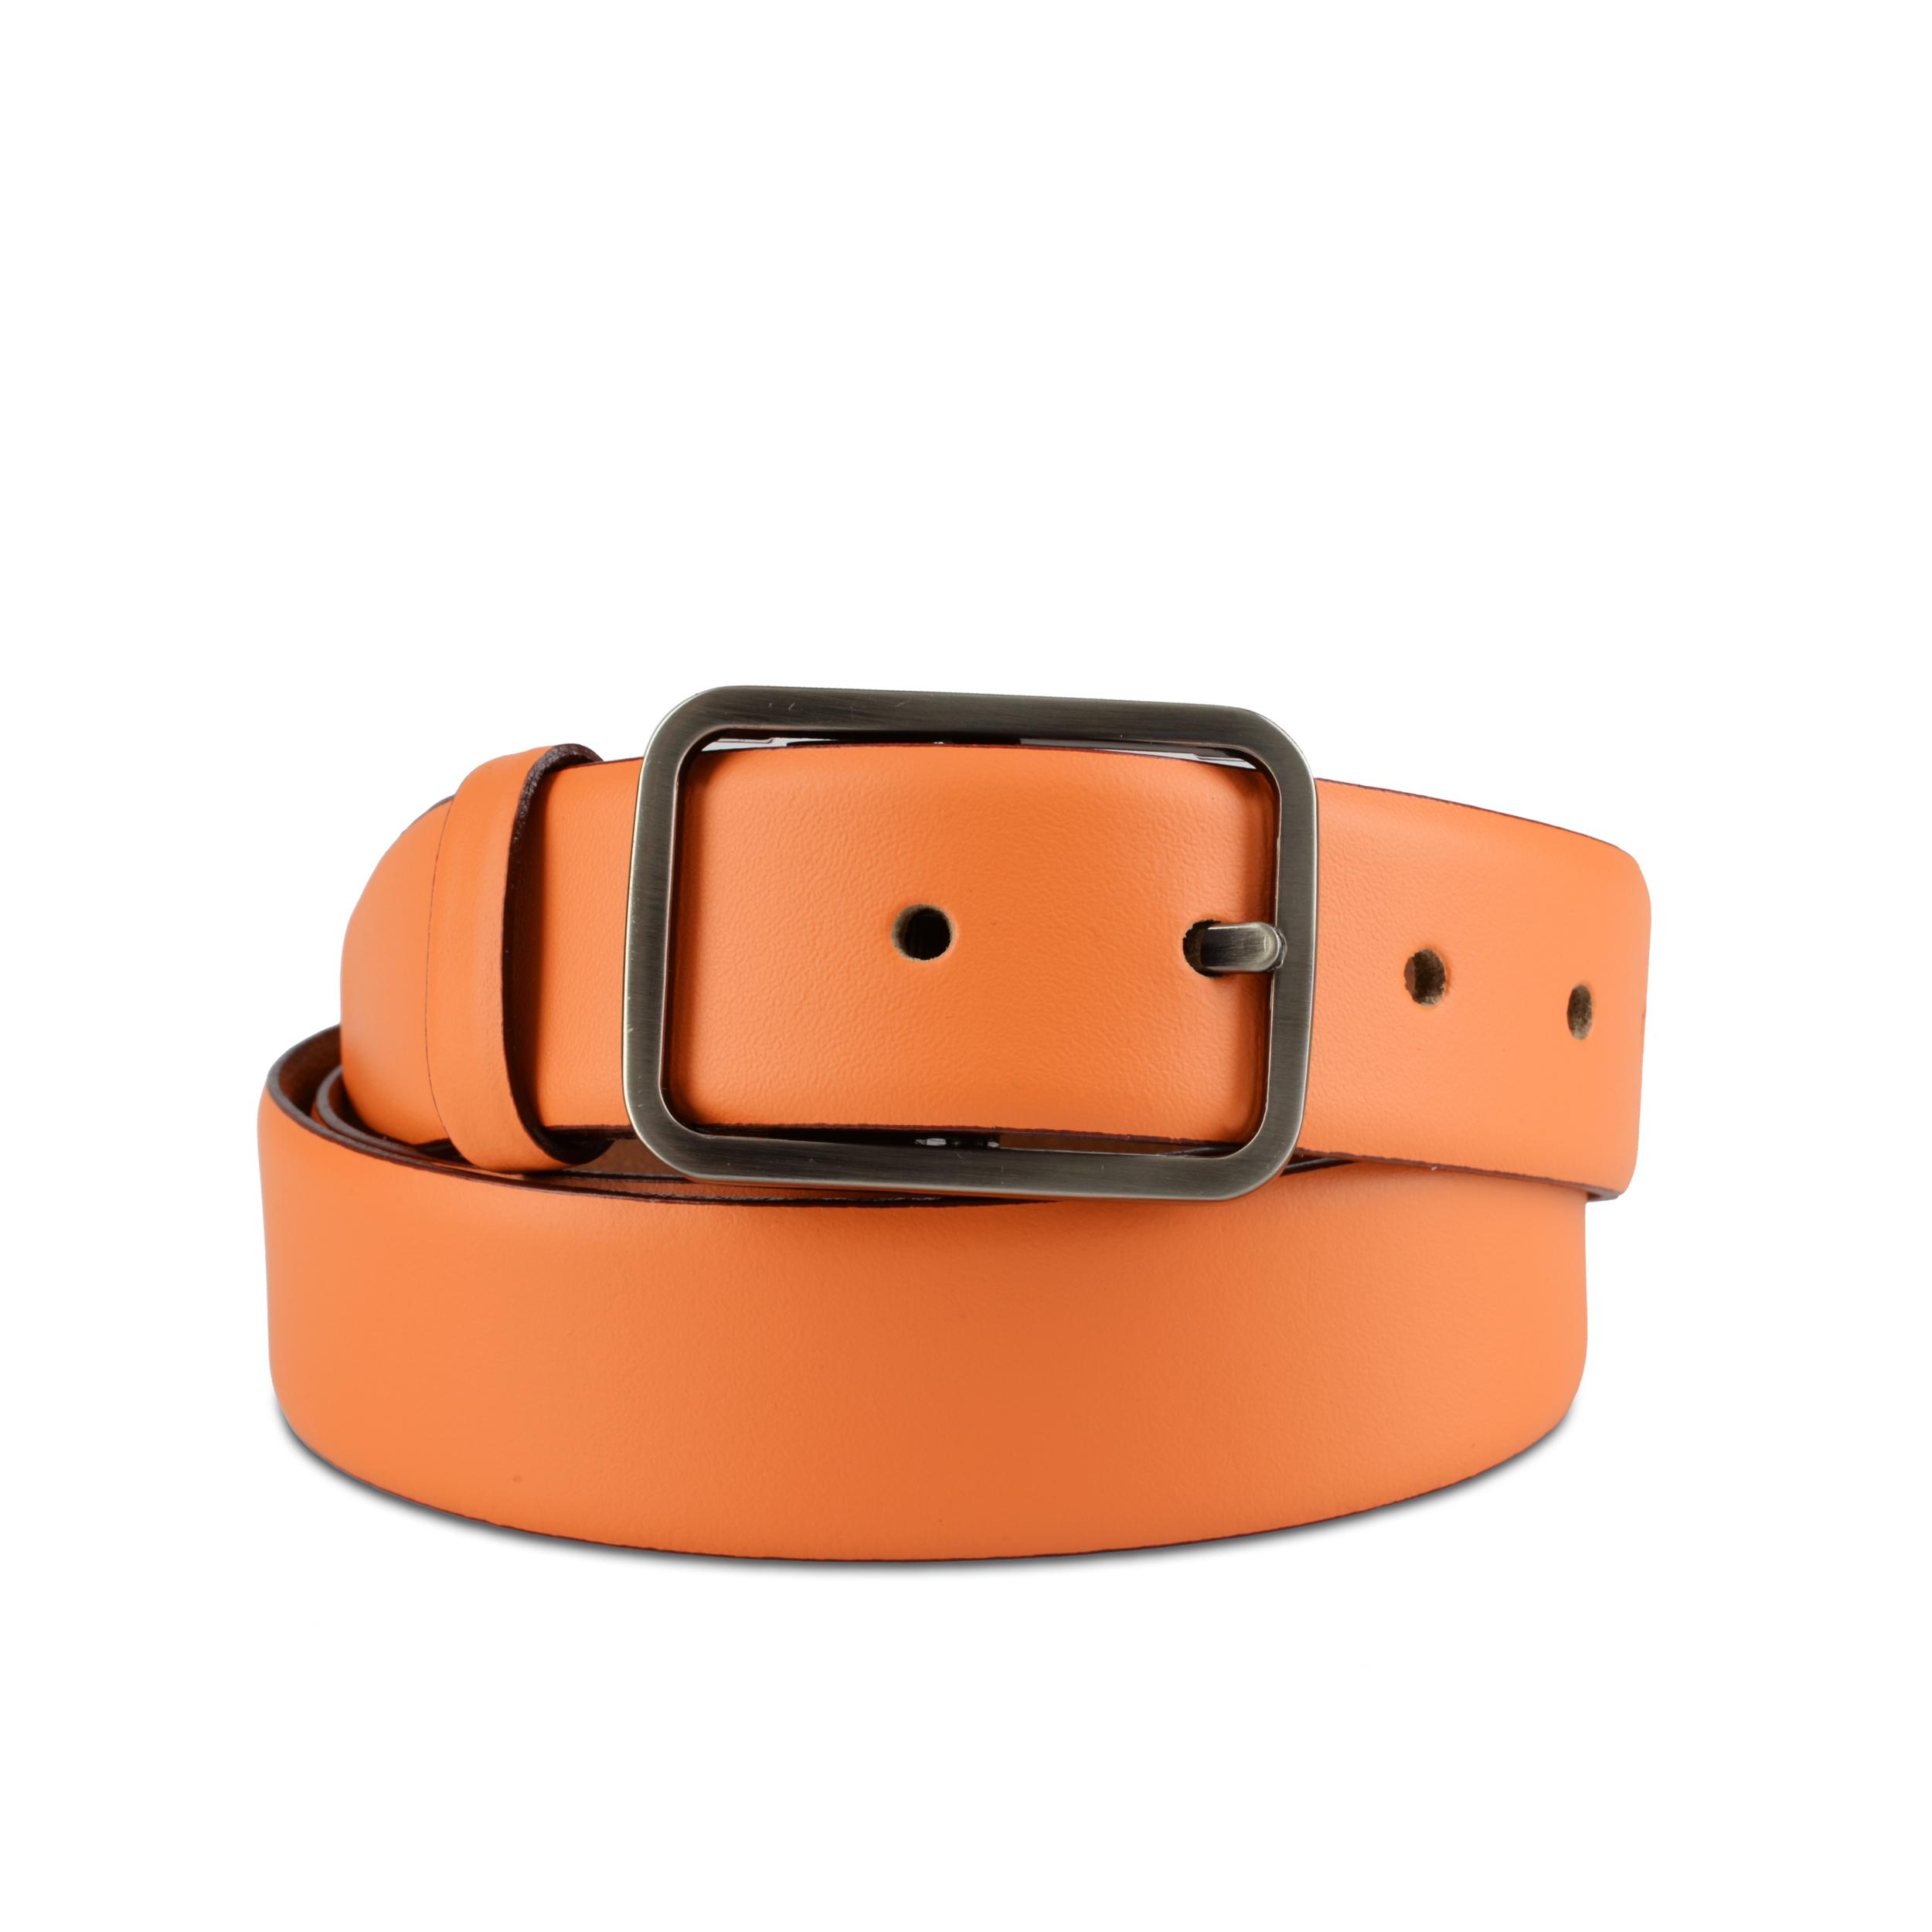 CT-00080-orange-F16-ceinture-femme-en-cuir-boucle-amovible